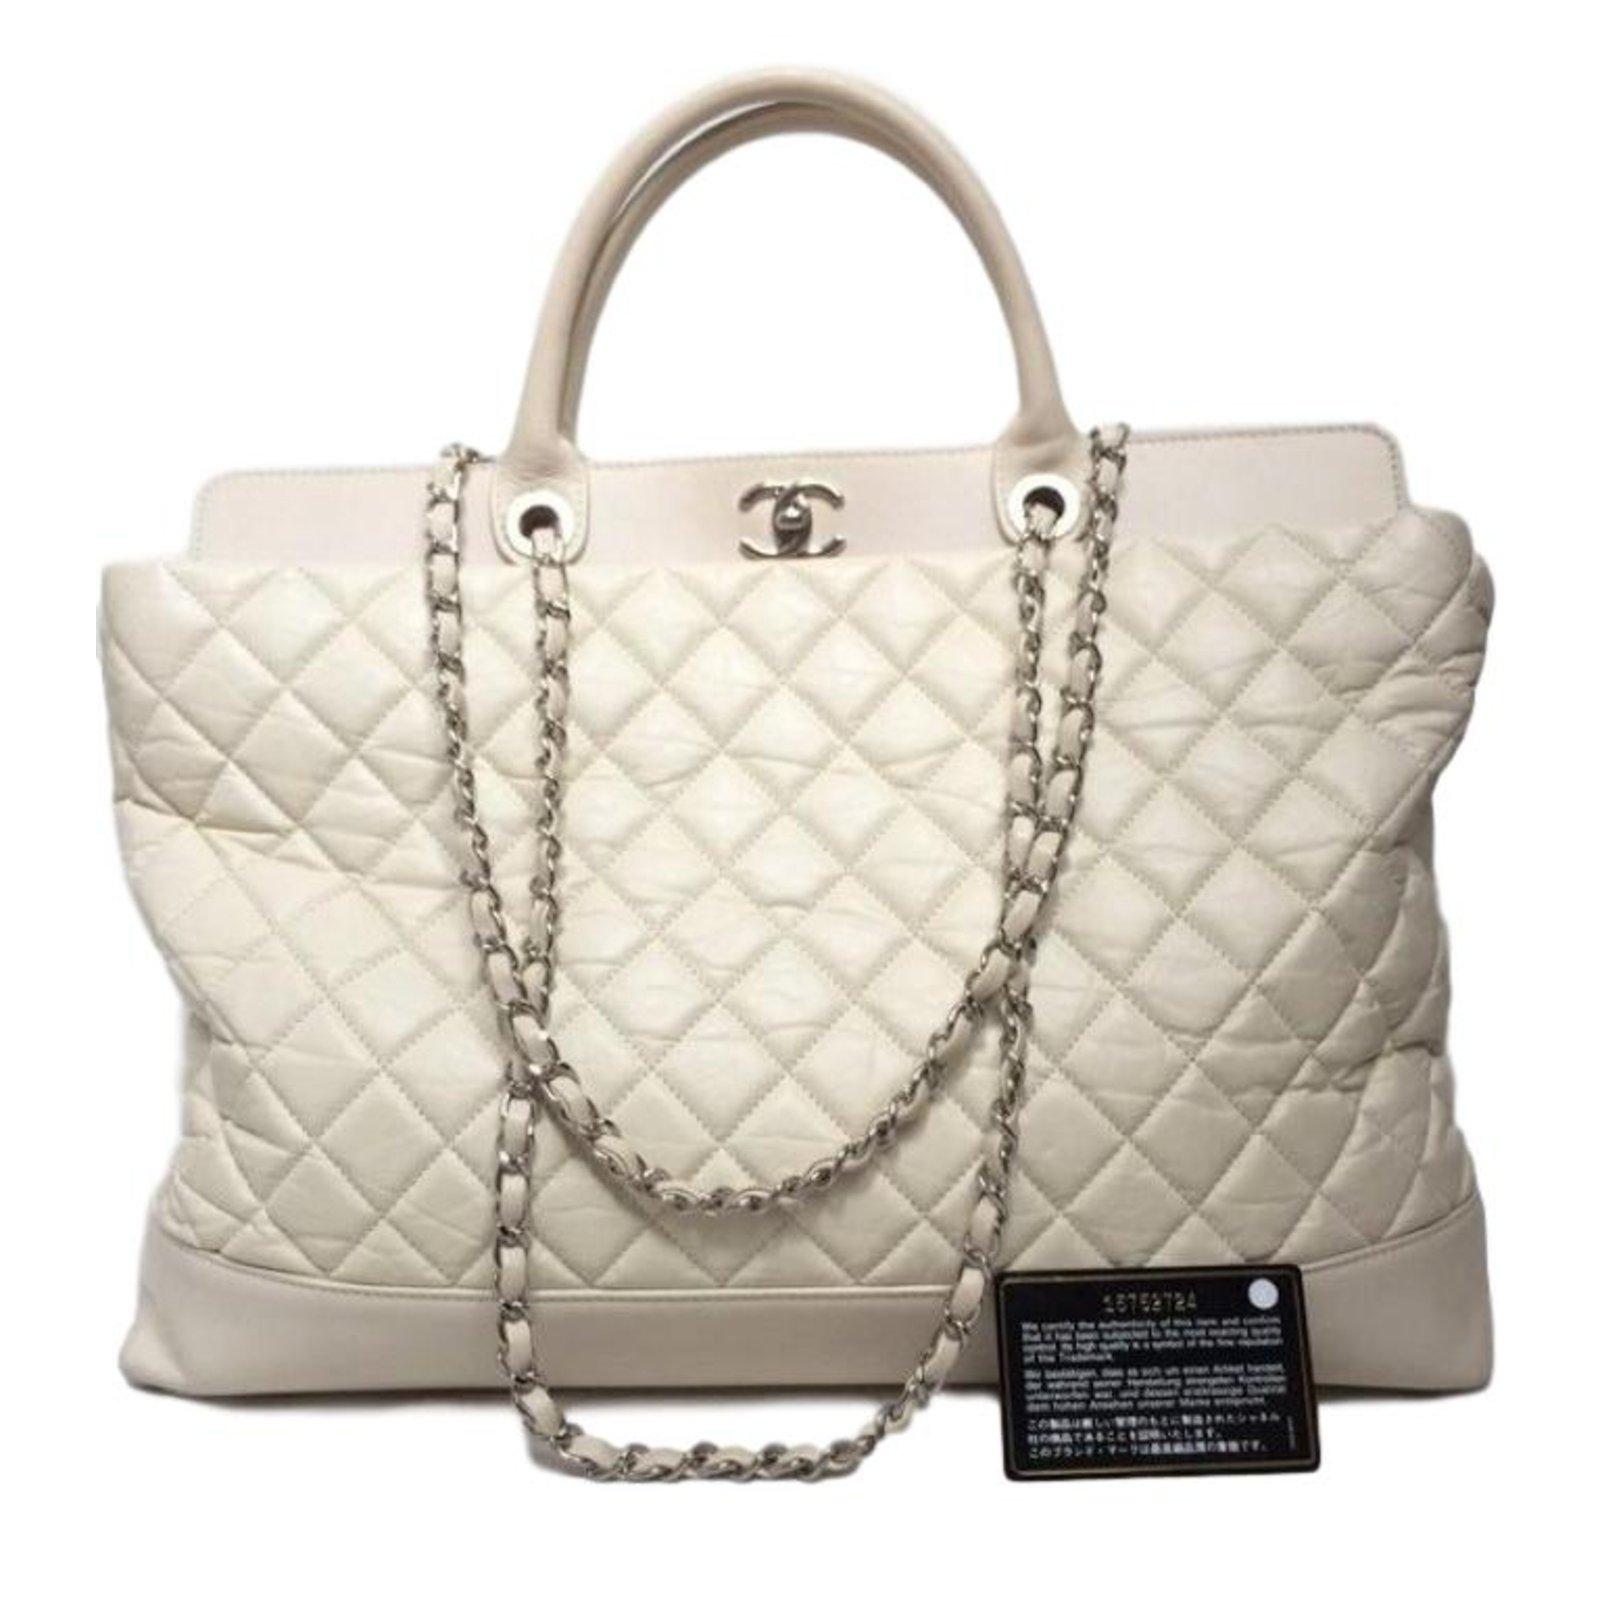 Chanel Handbags Leather Beige